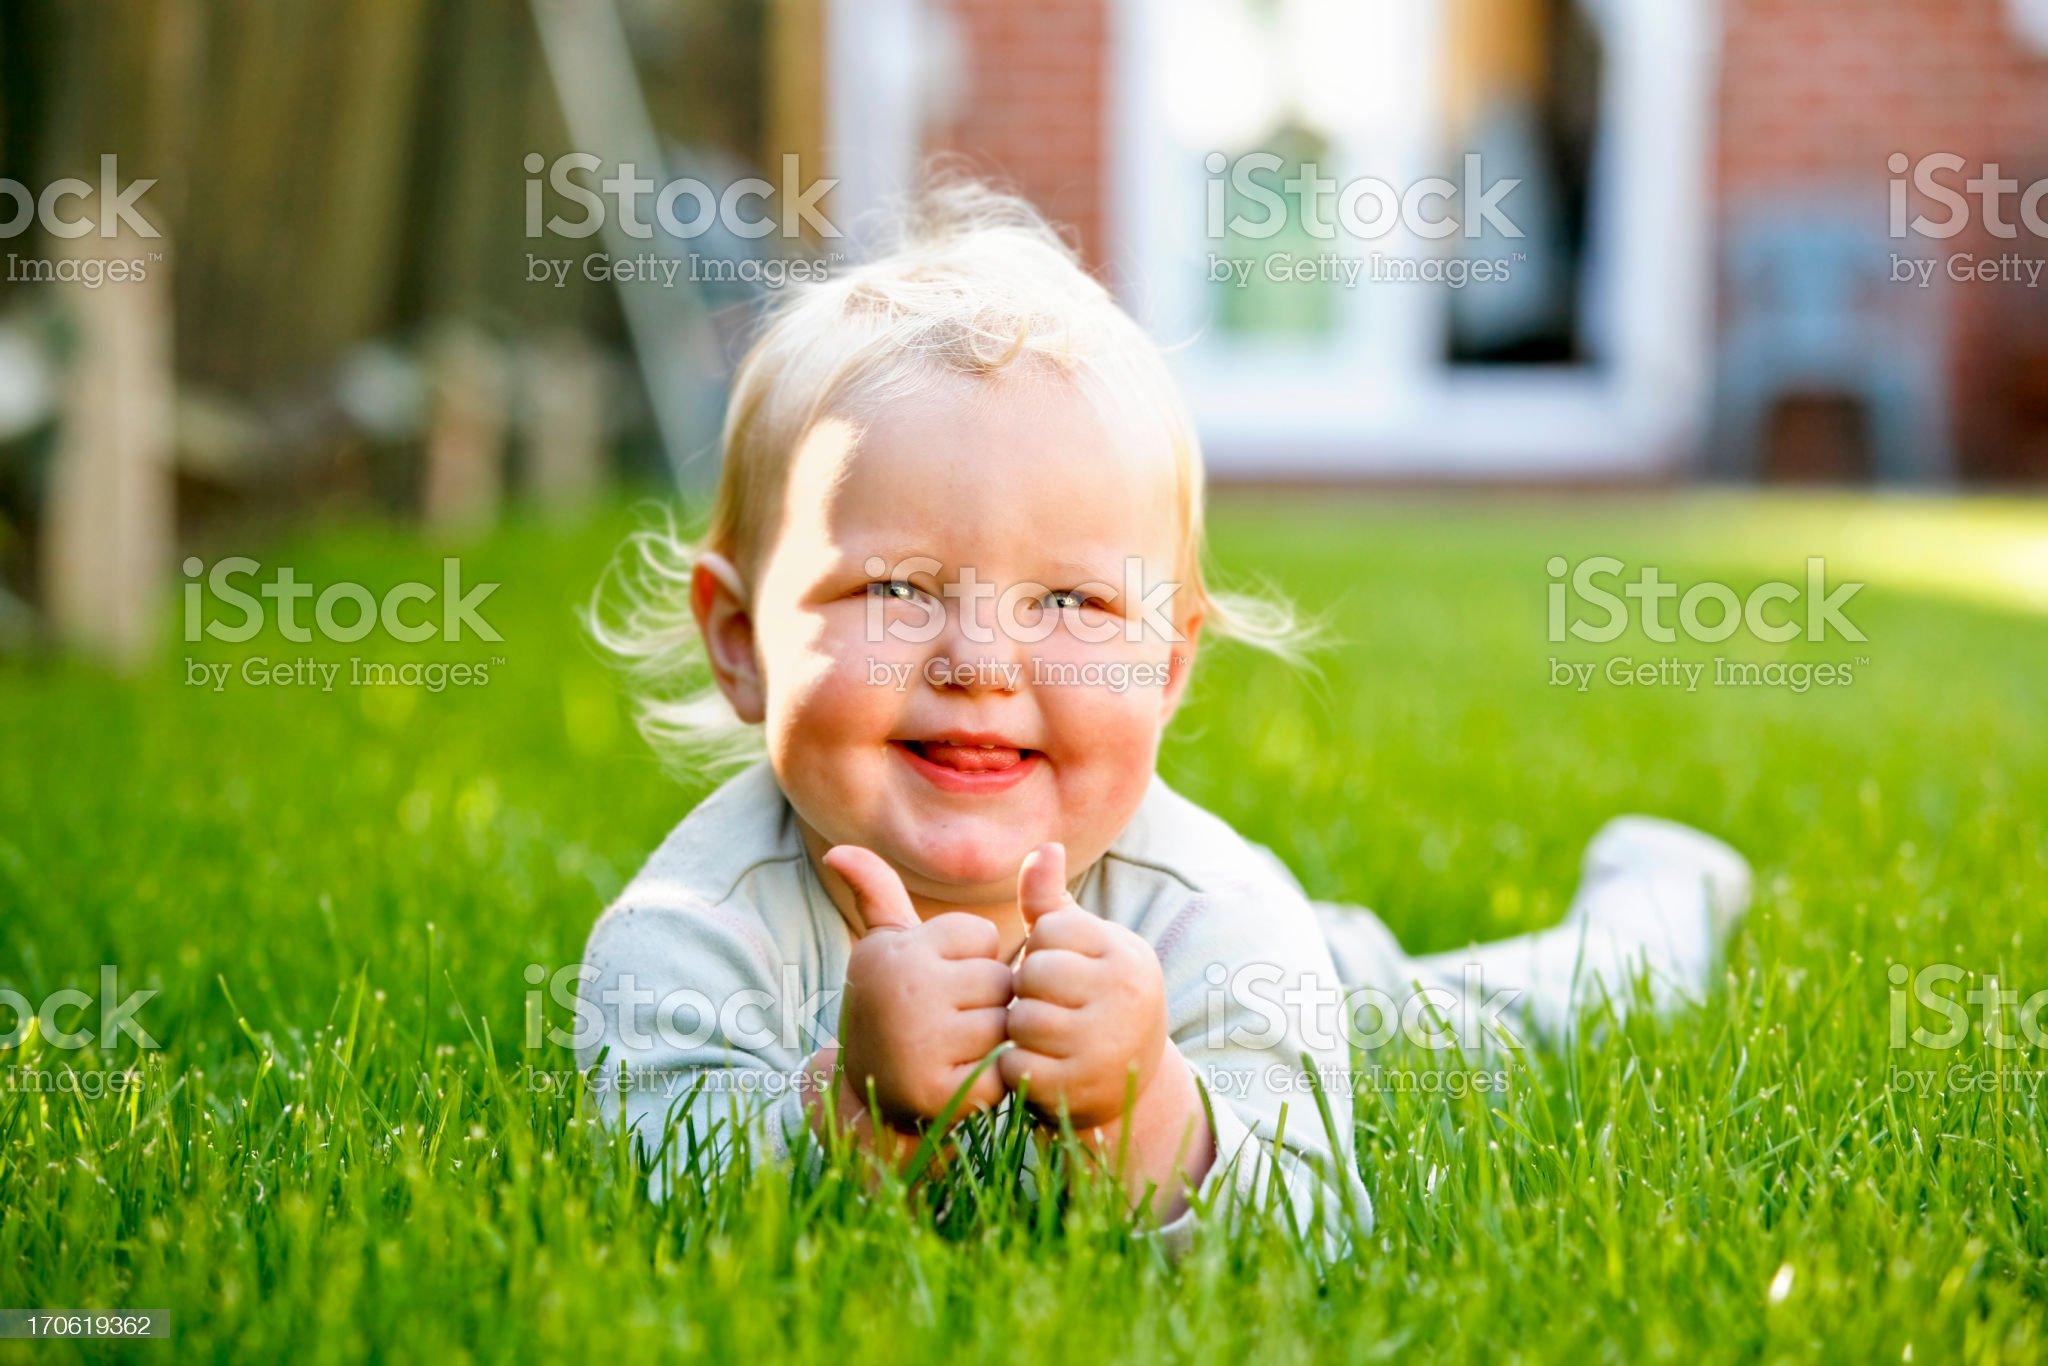 Cute Baby royalty-free stock photo